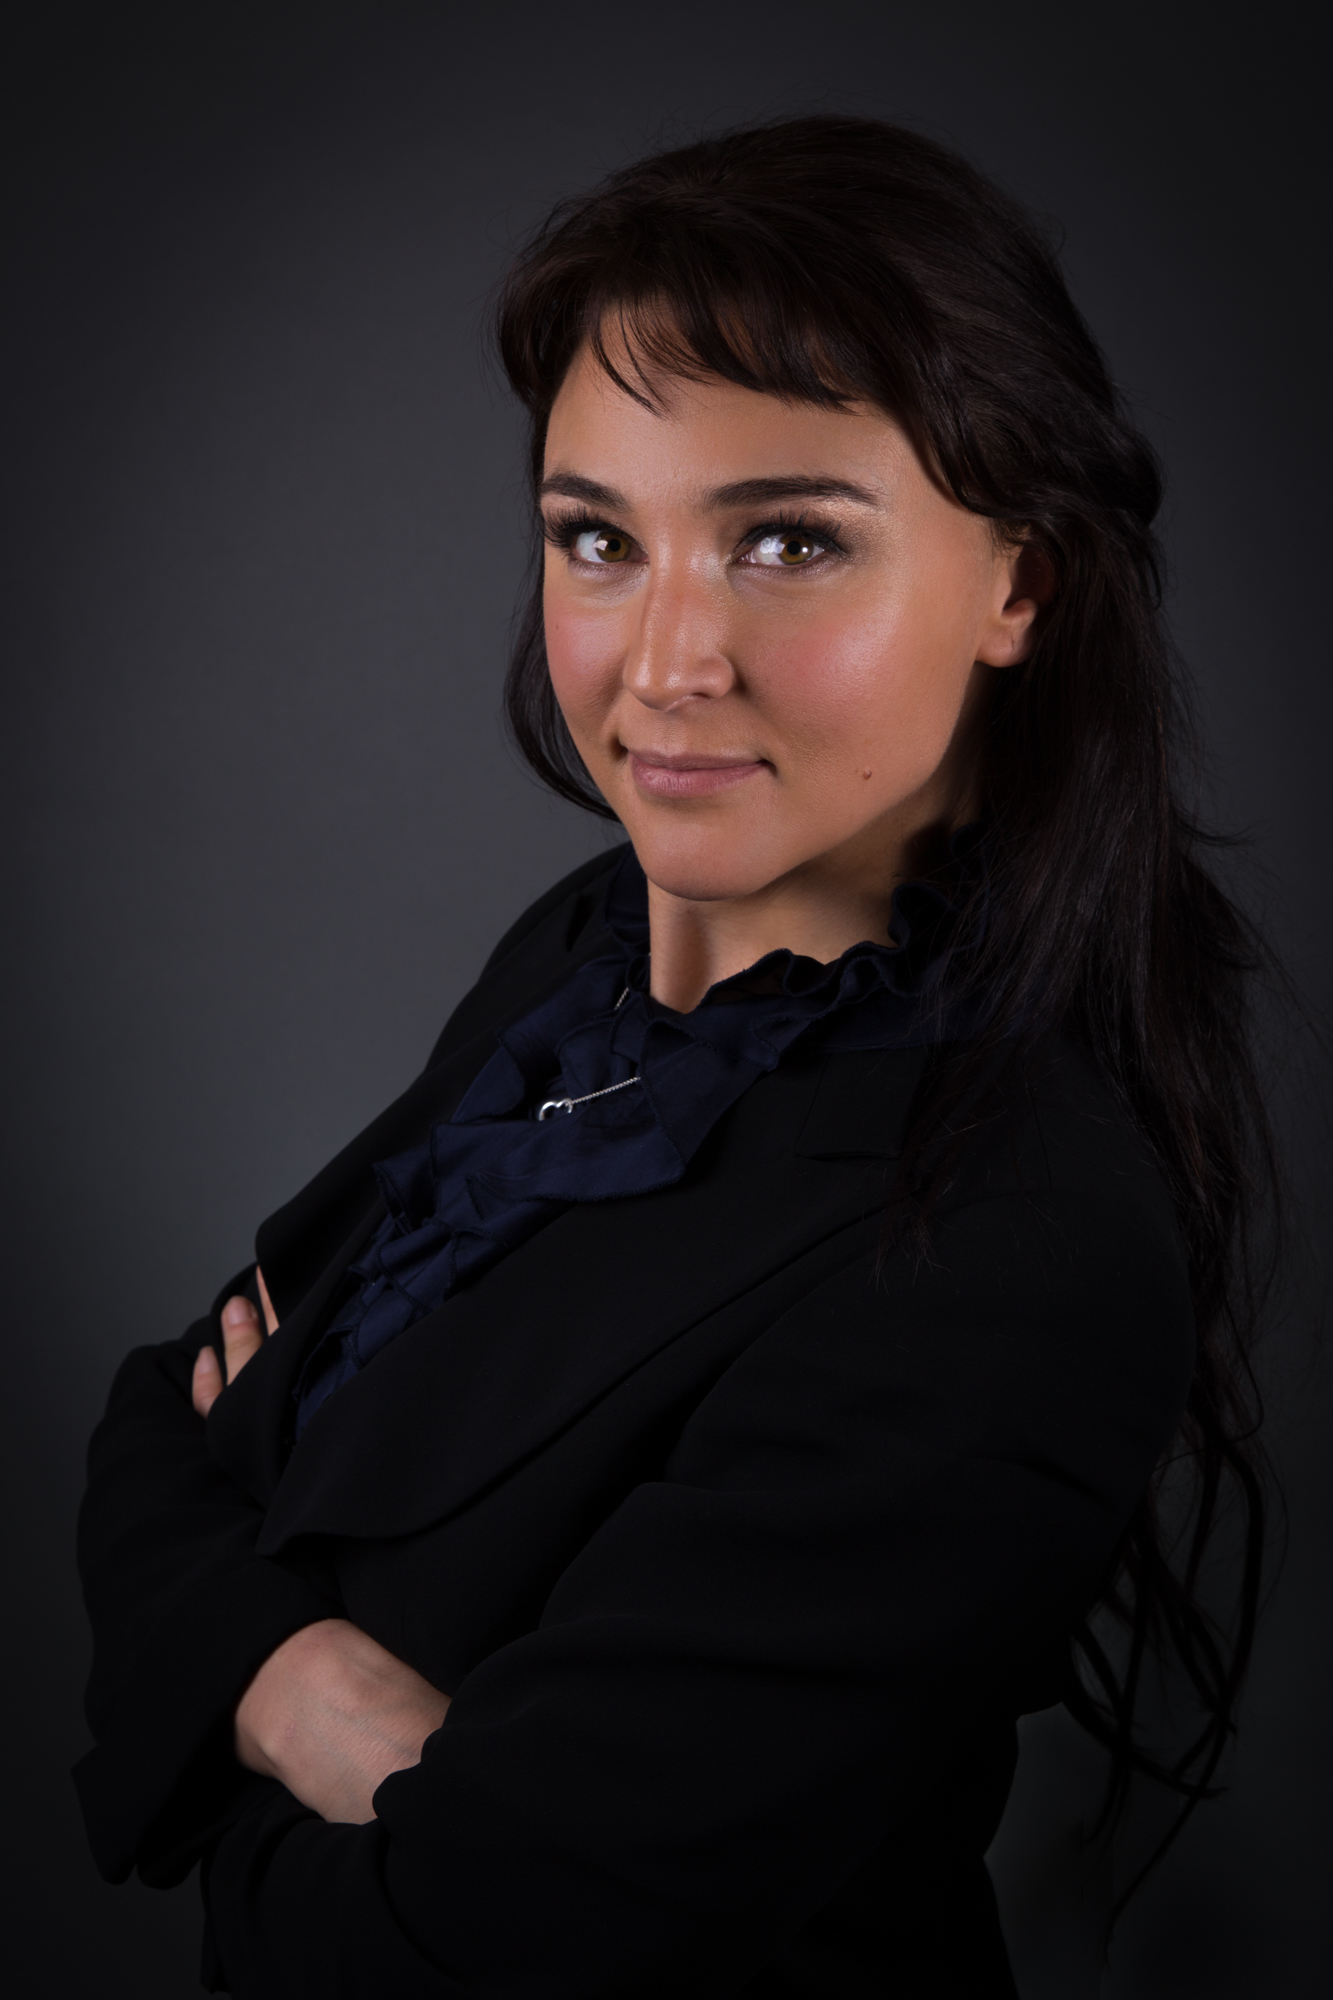 Stefanie Suydam